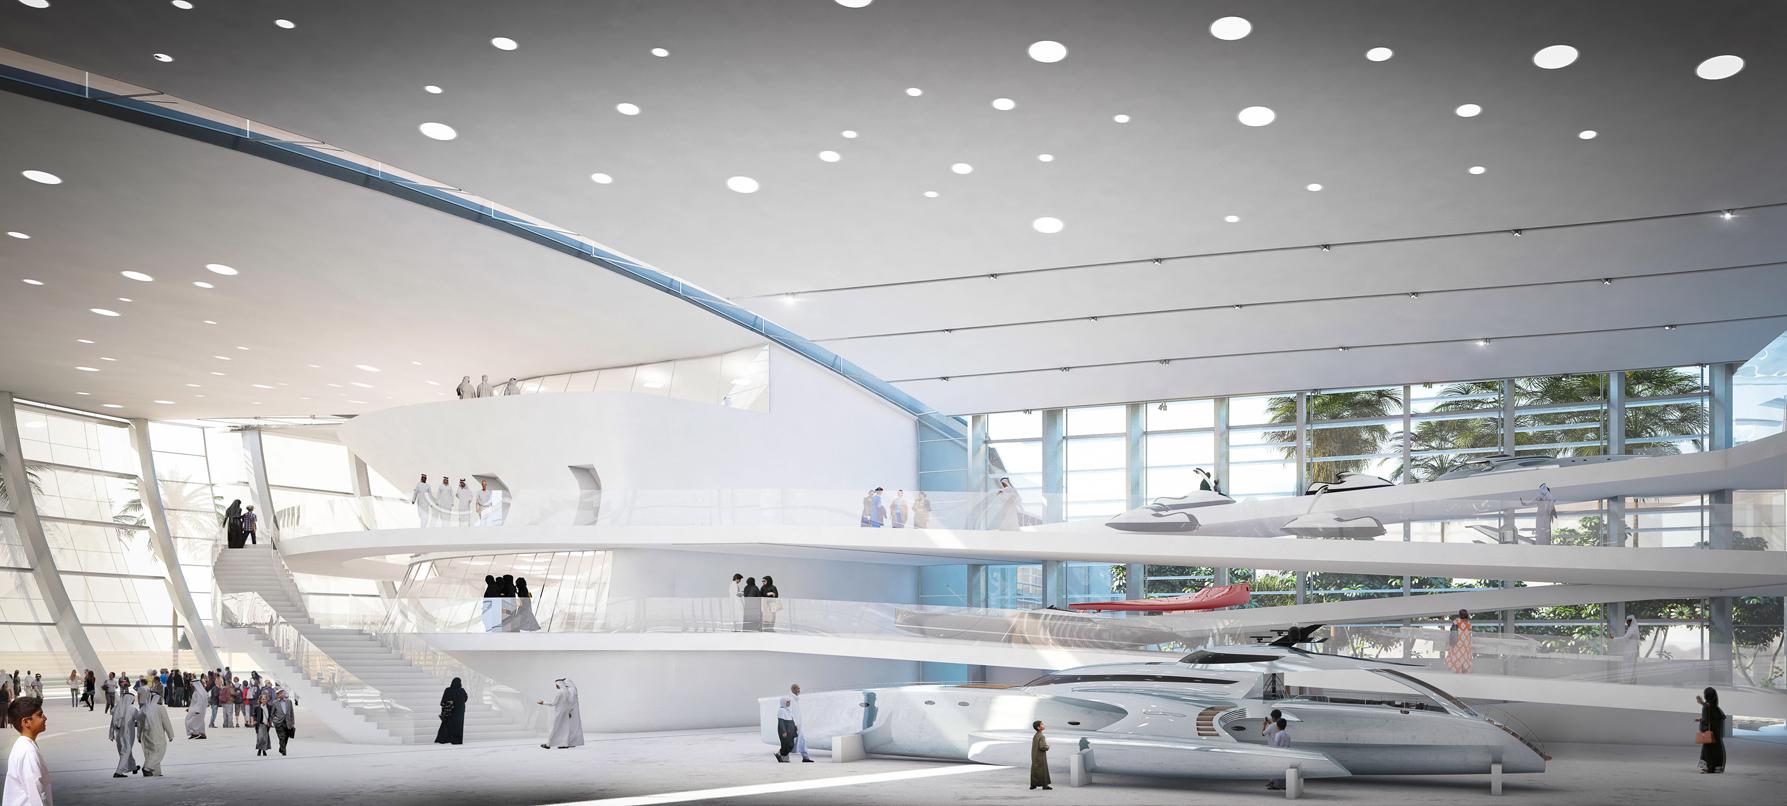 musée du transport